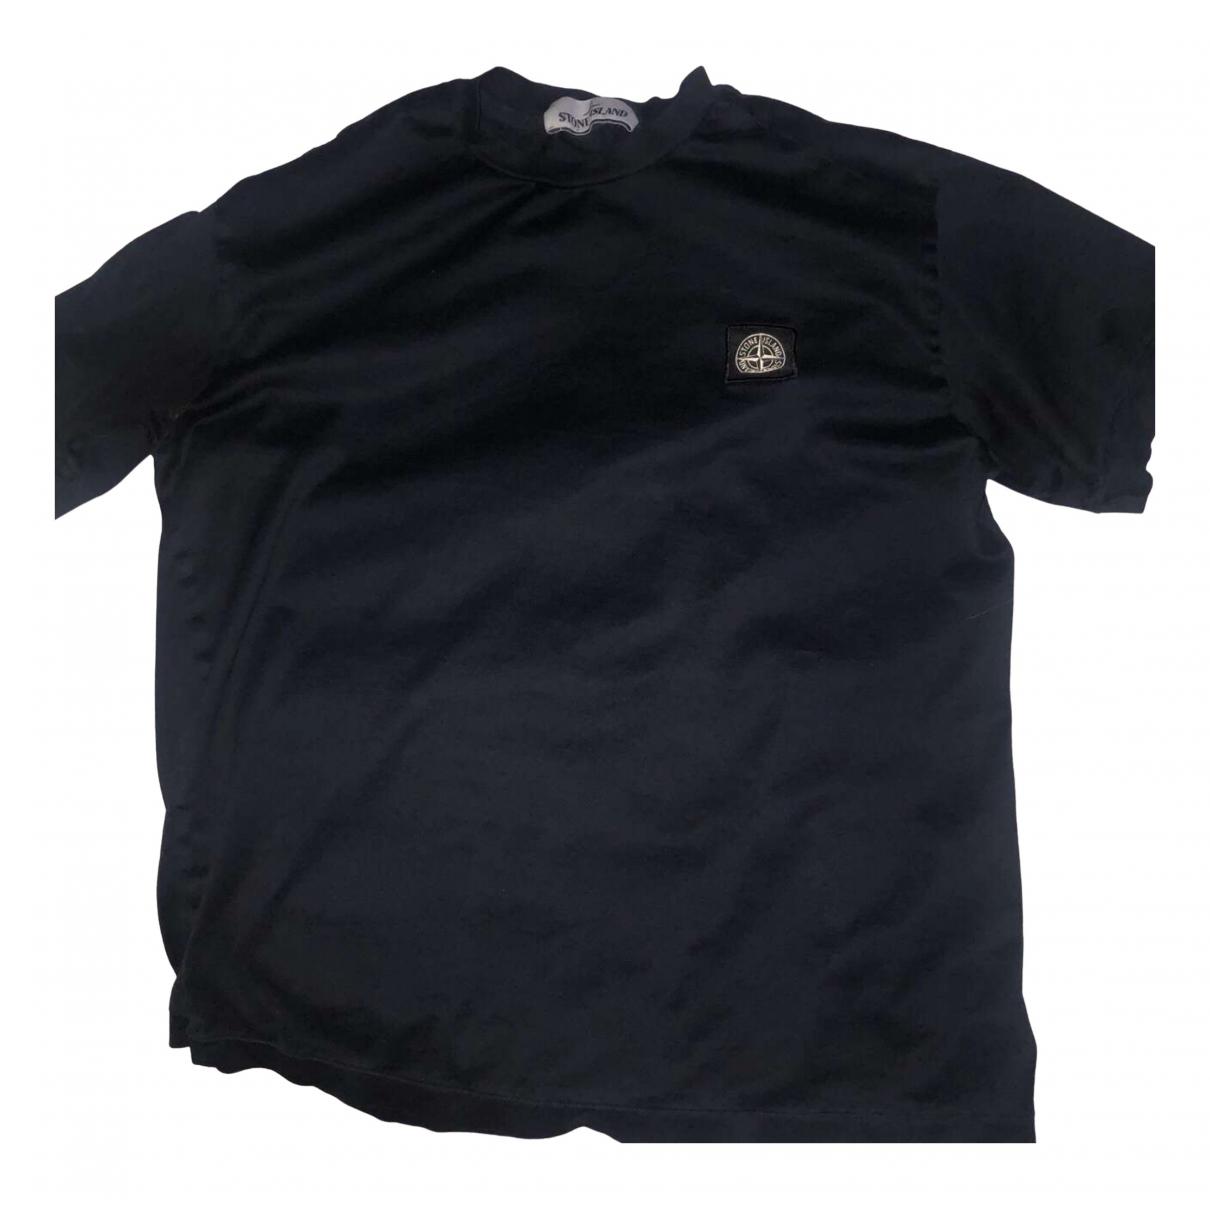 Stone Island \N Black Cotton T-shirts for Men XS International